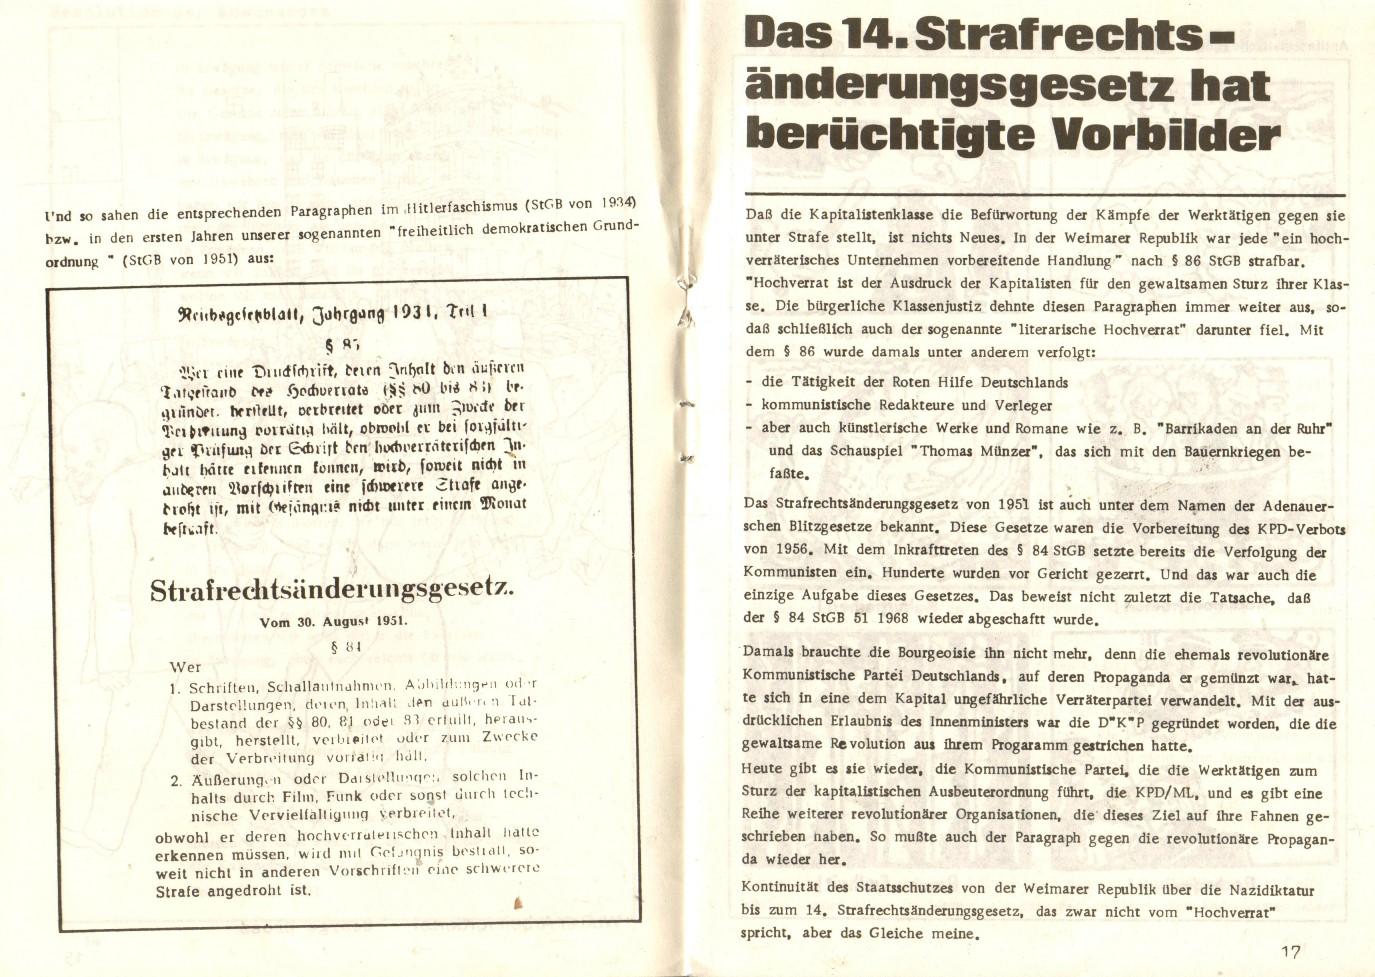 RHD_1976_Doku_Strafrechtsaenderungsgesetz_09